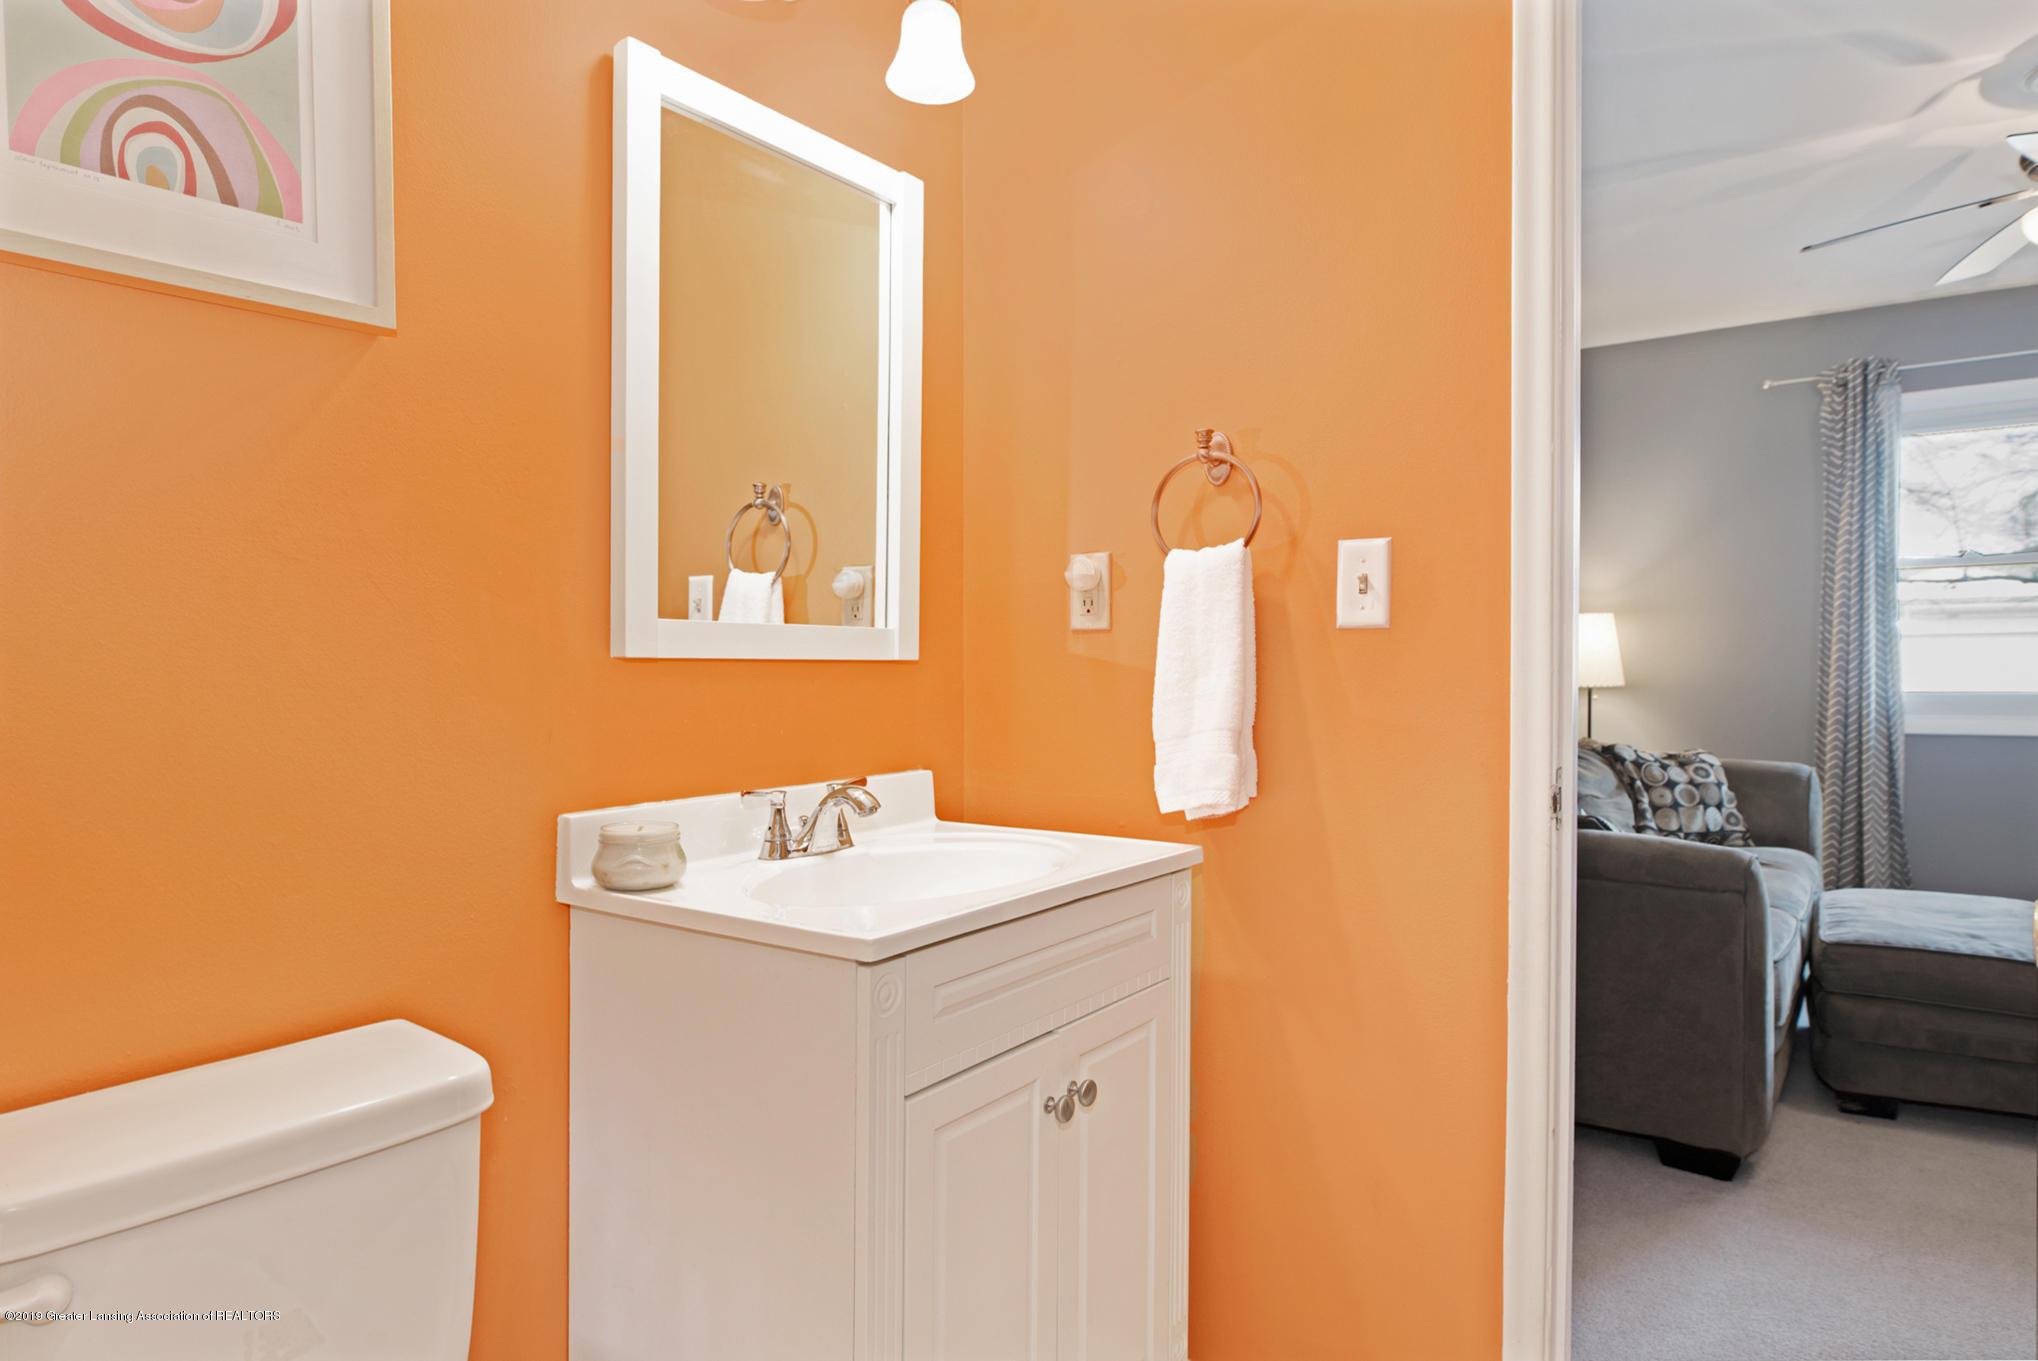 981 Ramblewood Dr - Bathroom 2 - 22